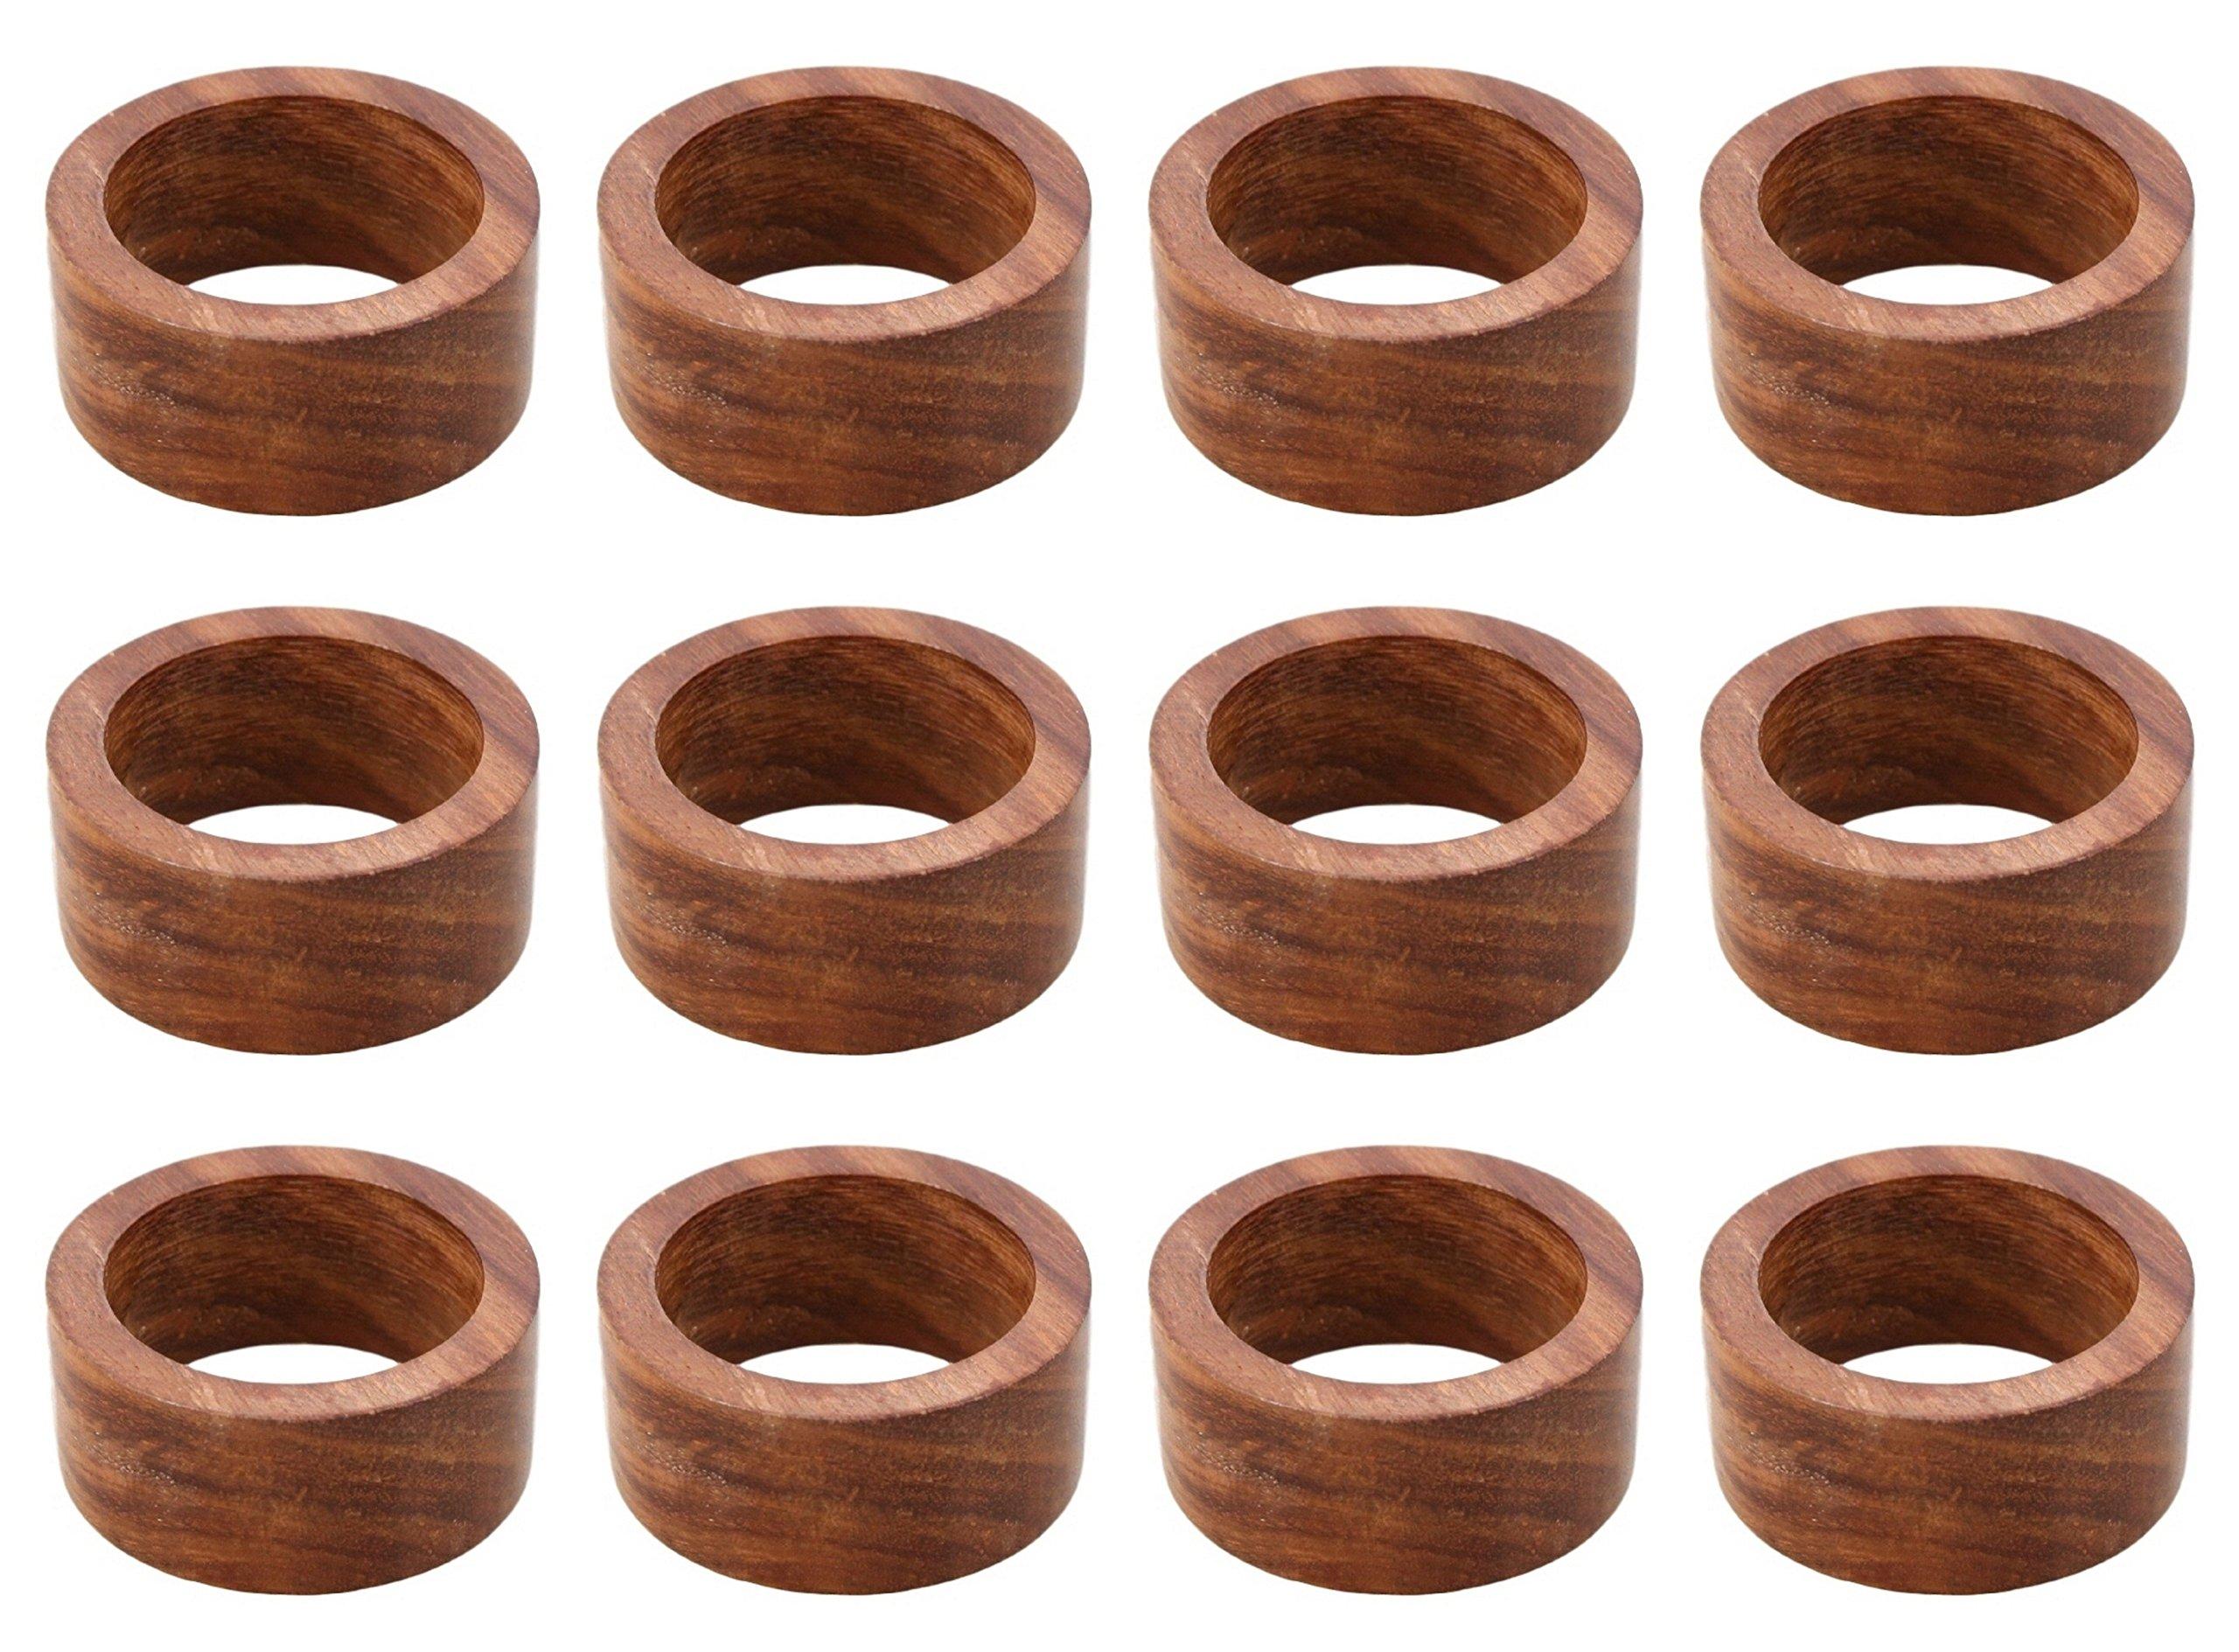 ARN Craft Handmade Wood Napkin Ring Set With 12 Napkin Rings (CW- 05-12)